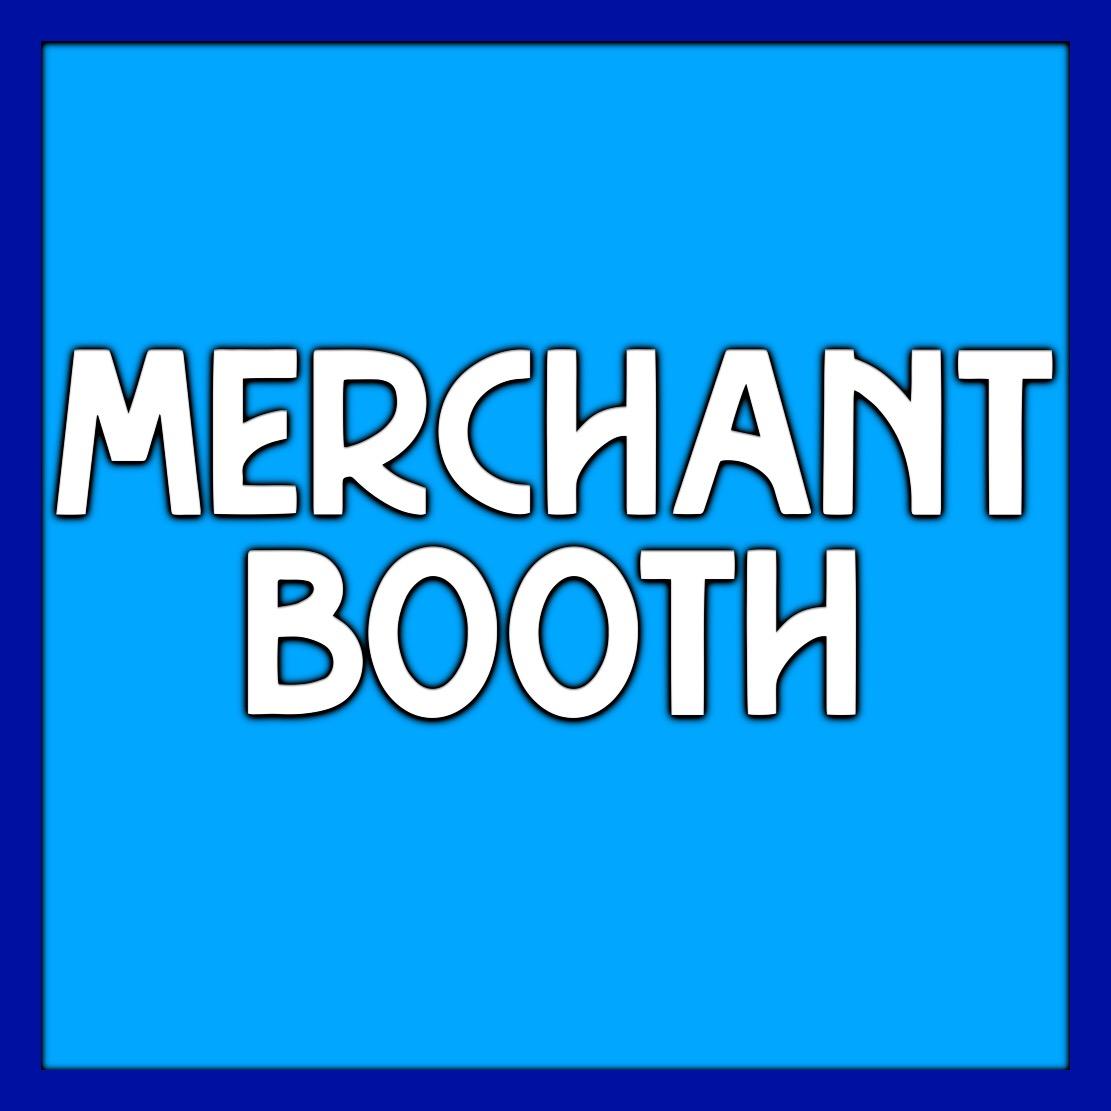 Oahu Merchant Booth